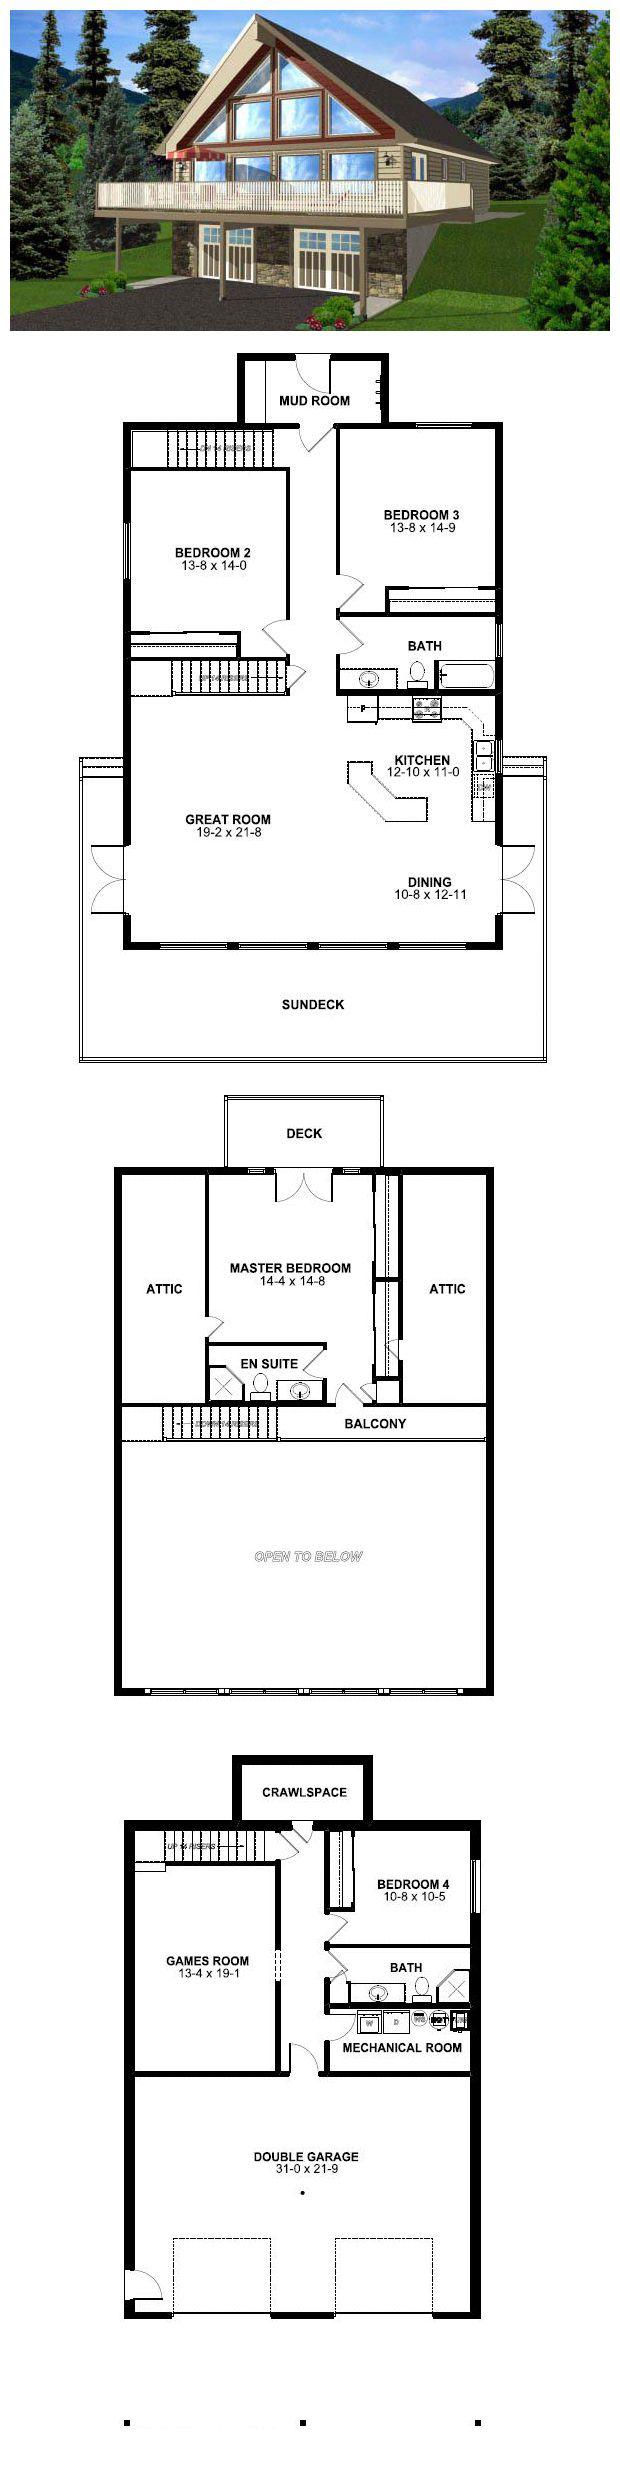 best 25 3 car garage ideas on pinterest 3 car garage plans a frame house plan 99976